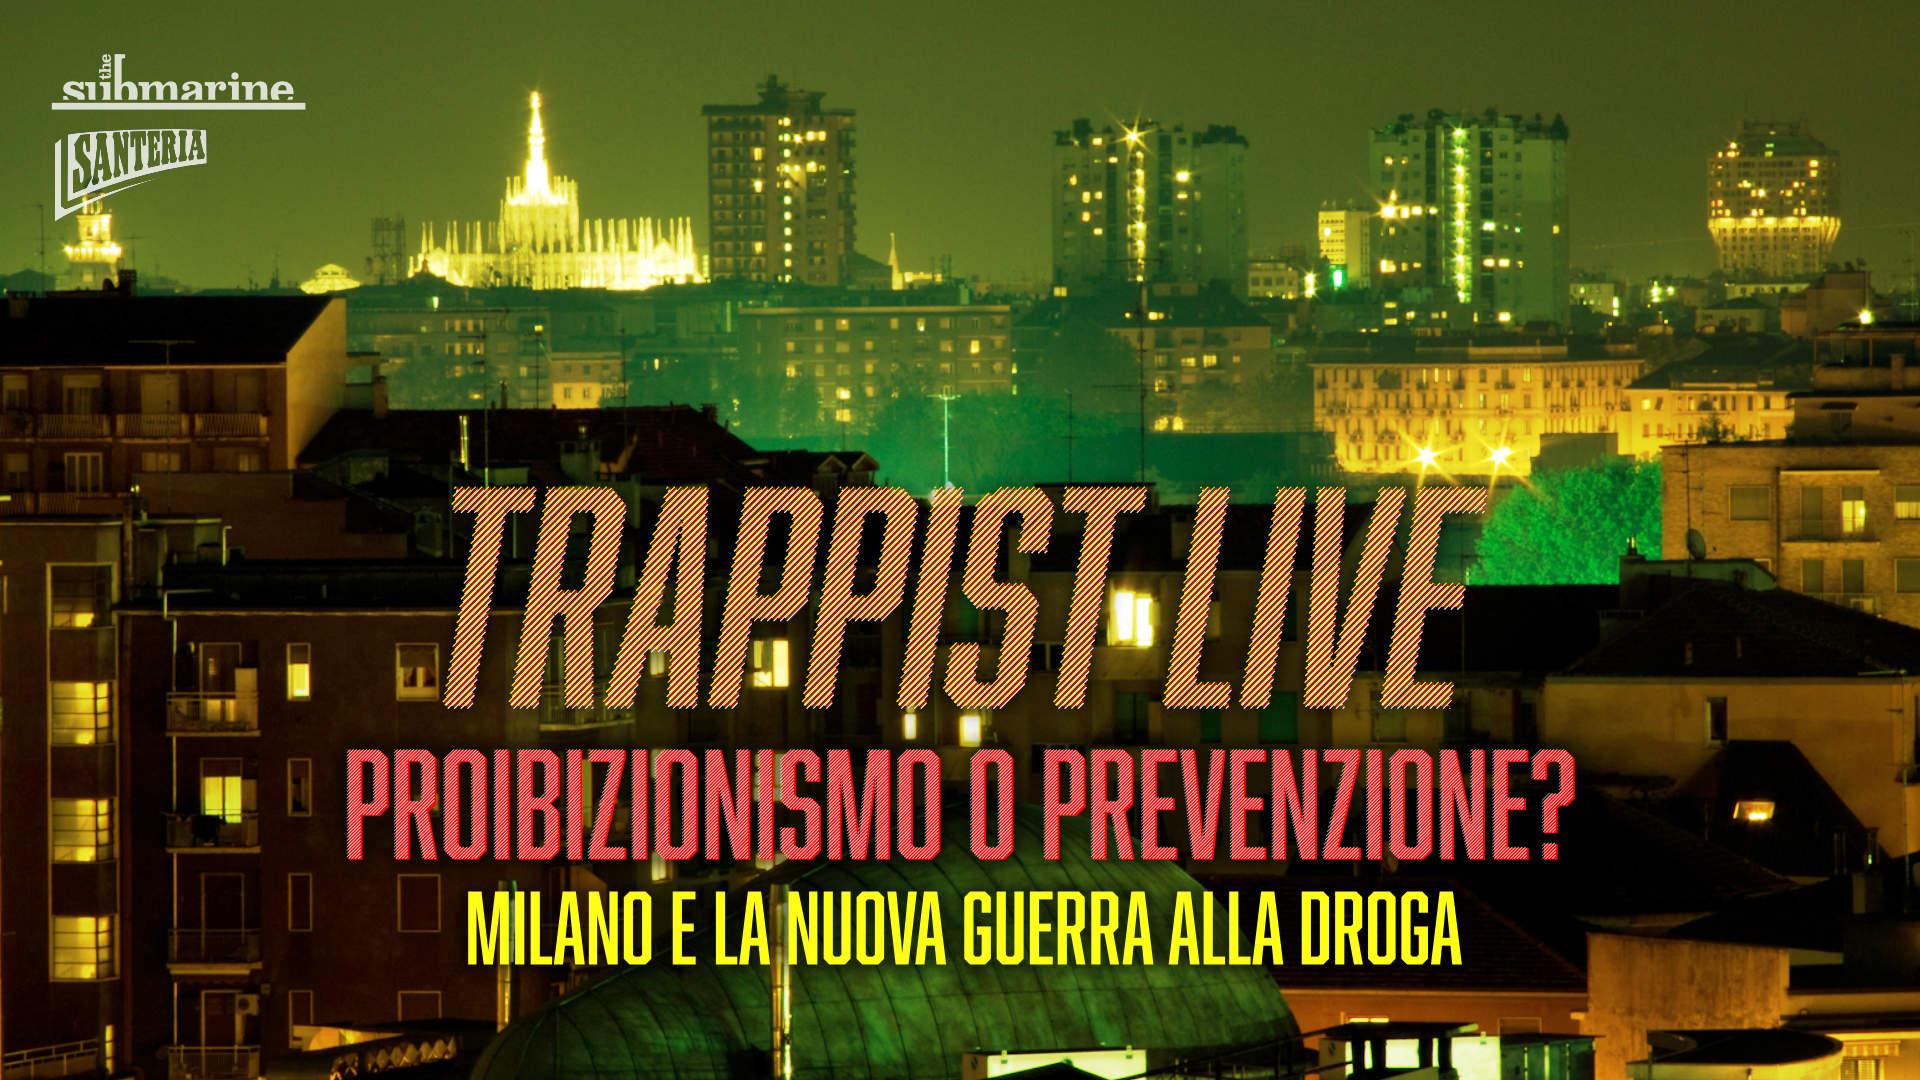 Vieni ad ascoltare <em>TRAPPIST</em> in diretta mercoledì 3 aprile alle 19:30 in Santeria Paladini 8